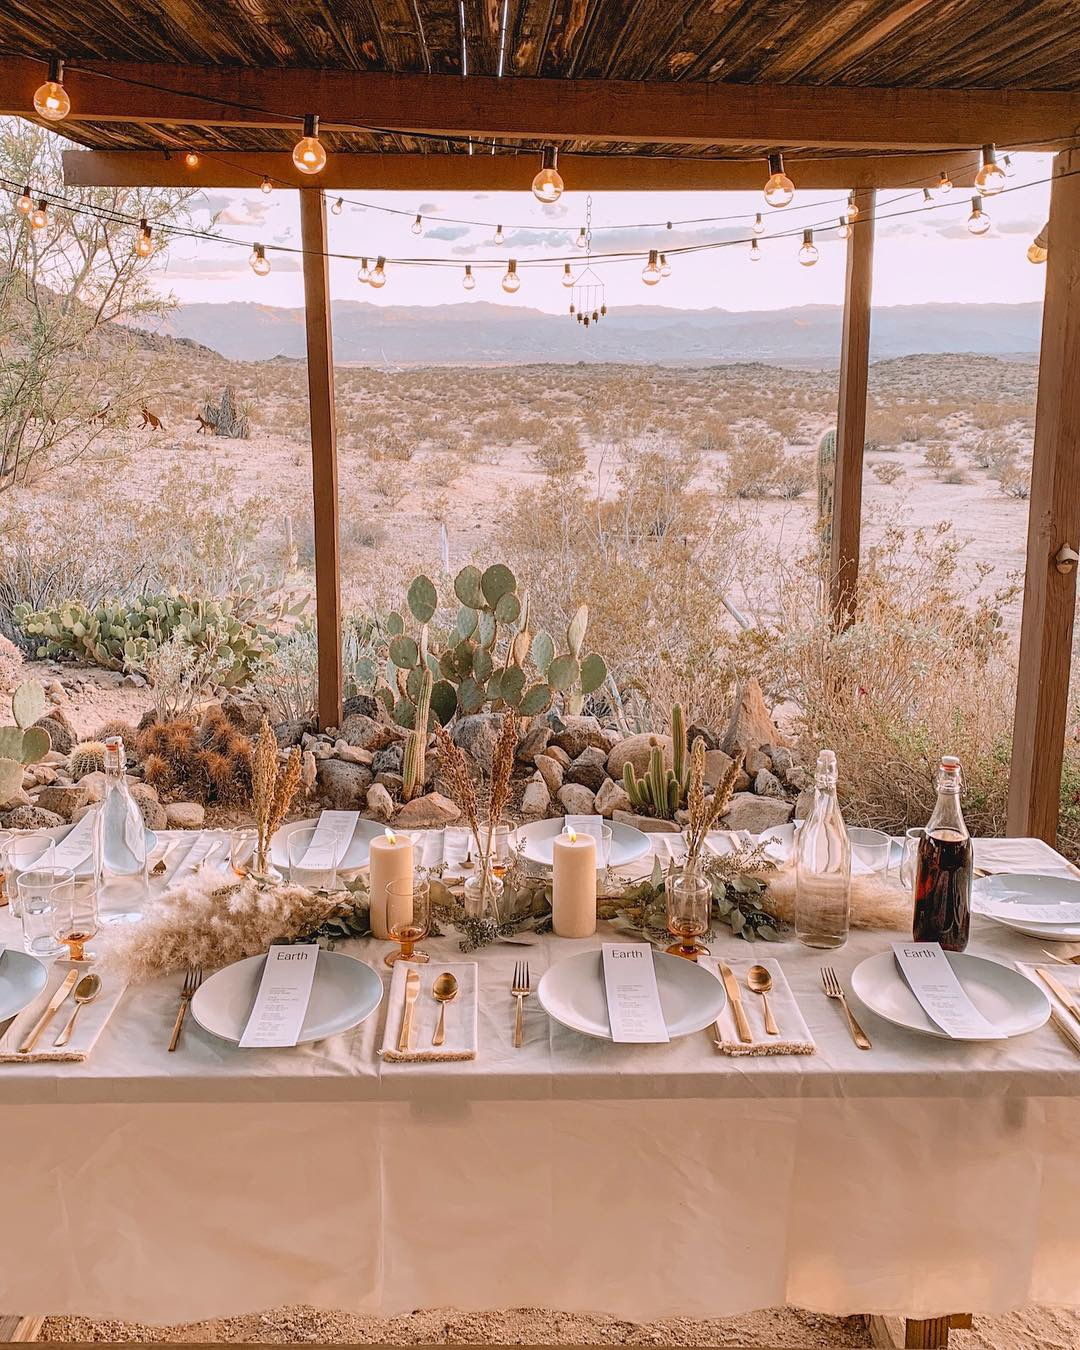 Joshua Tree, California | Fall '18 Hosts + Photography | Rich + Sara Combs